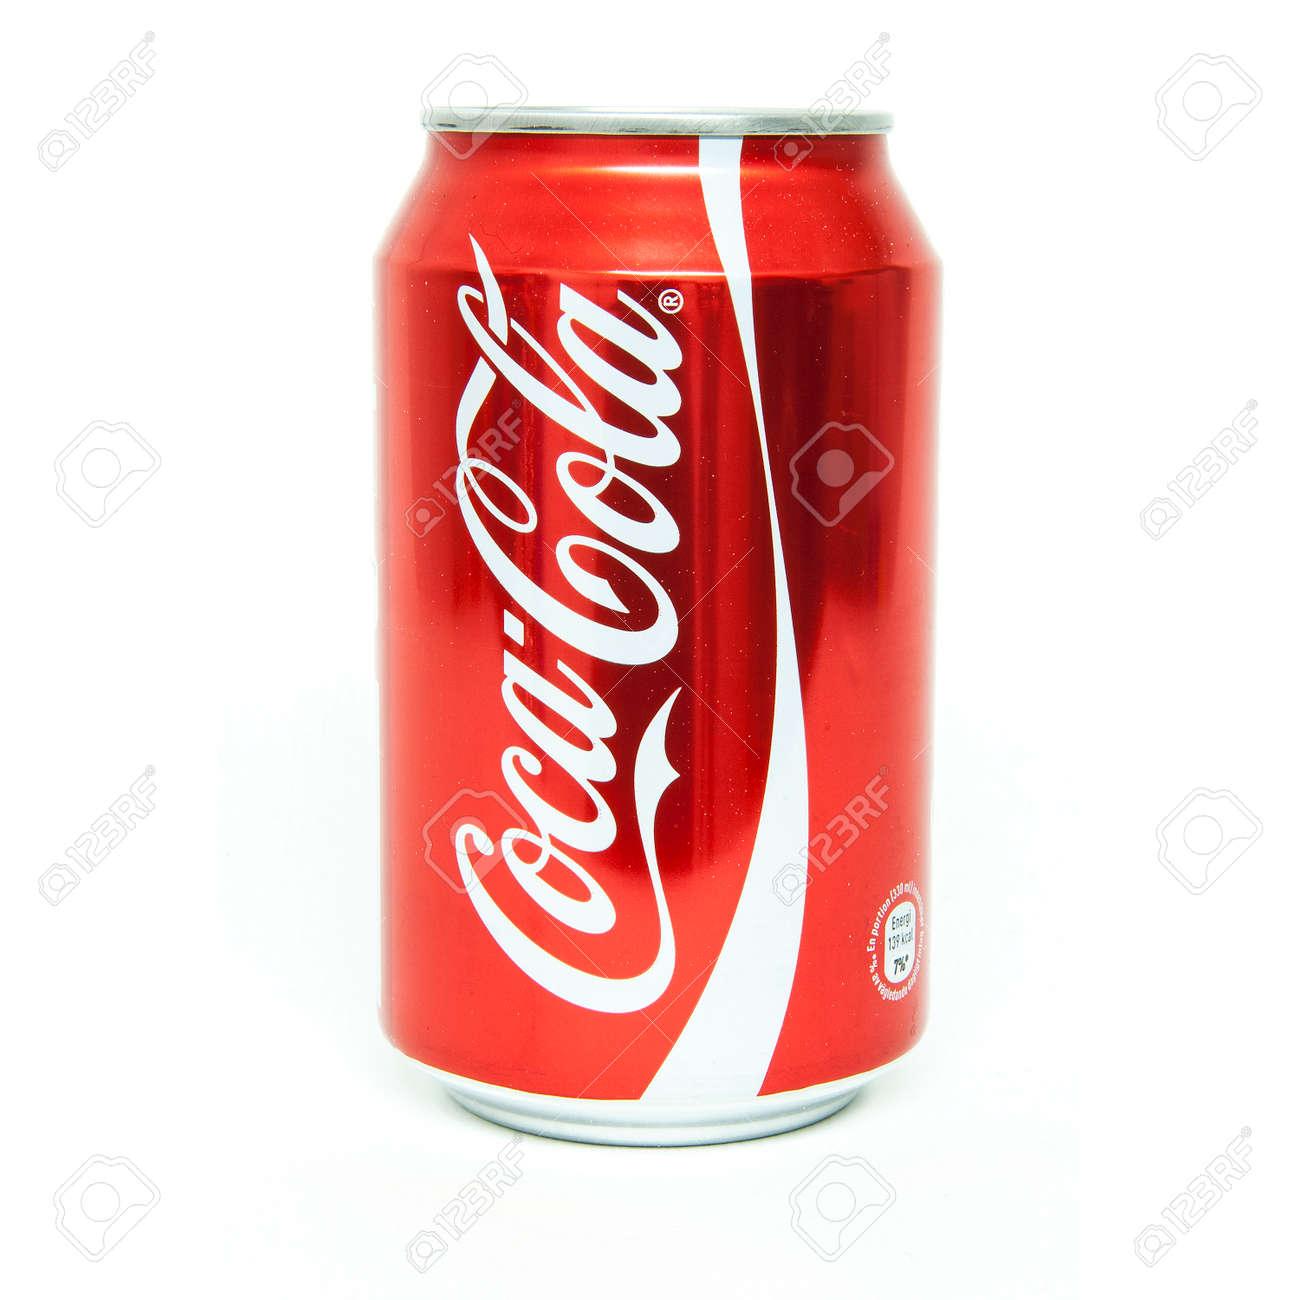 coca cola sweden